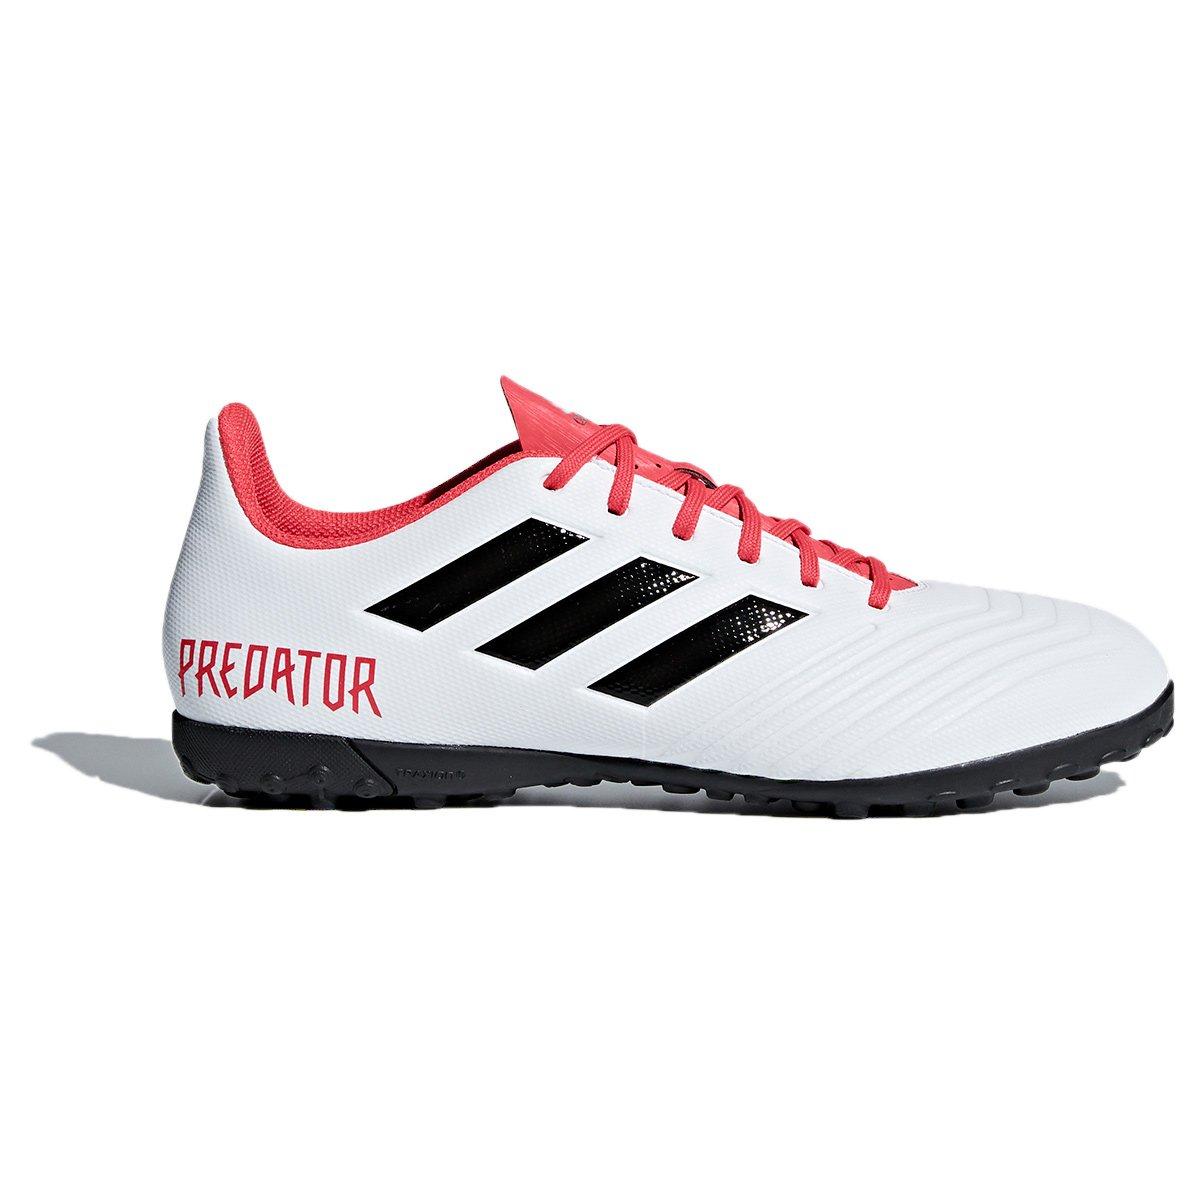 240fc156828ca Chuteira Society Adidas Predator 18.4 TF - Preto e Branco - Compre Agora